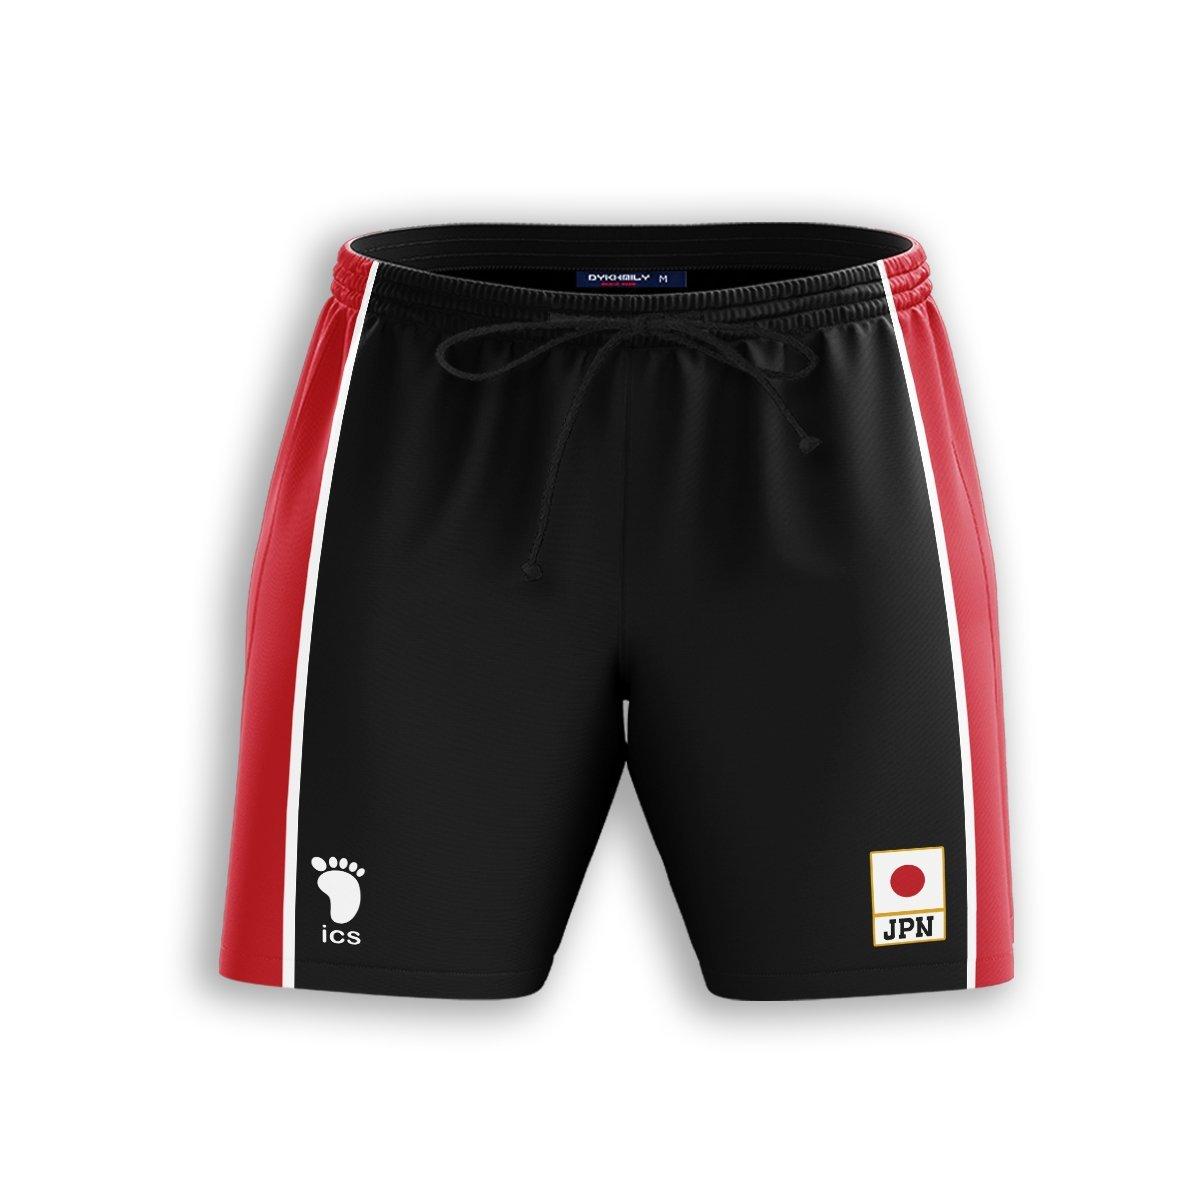 Haikyuu National Team Libero Beach Shorts FDM3107 S Official Anime Swimsuit Merch